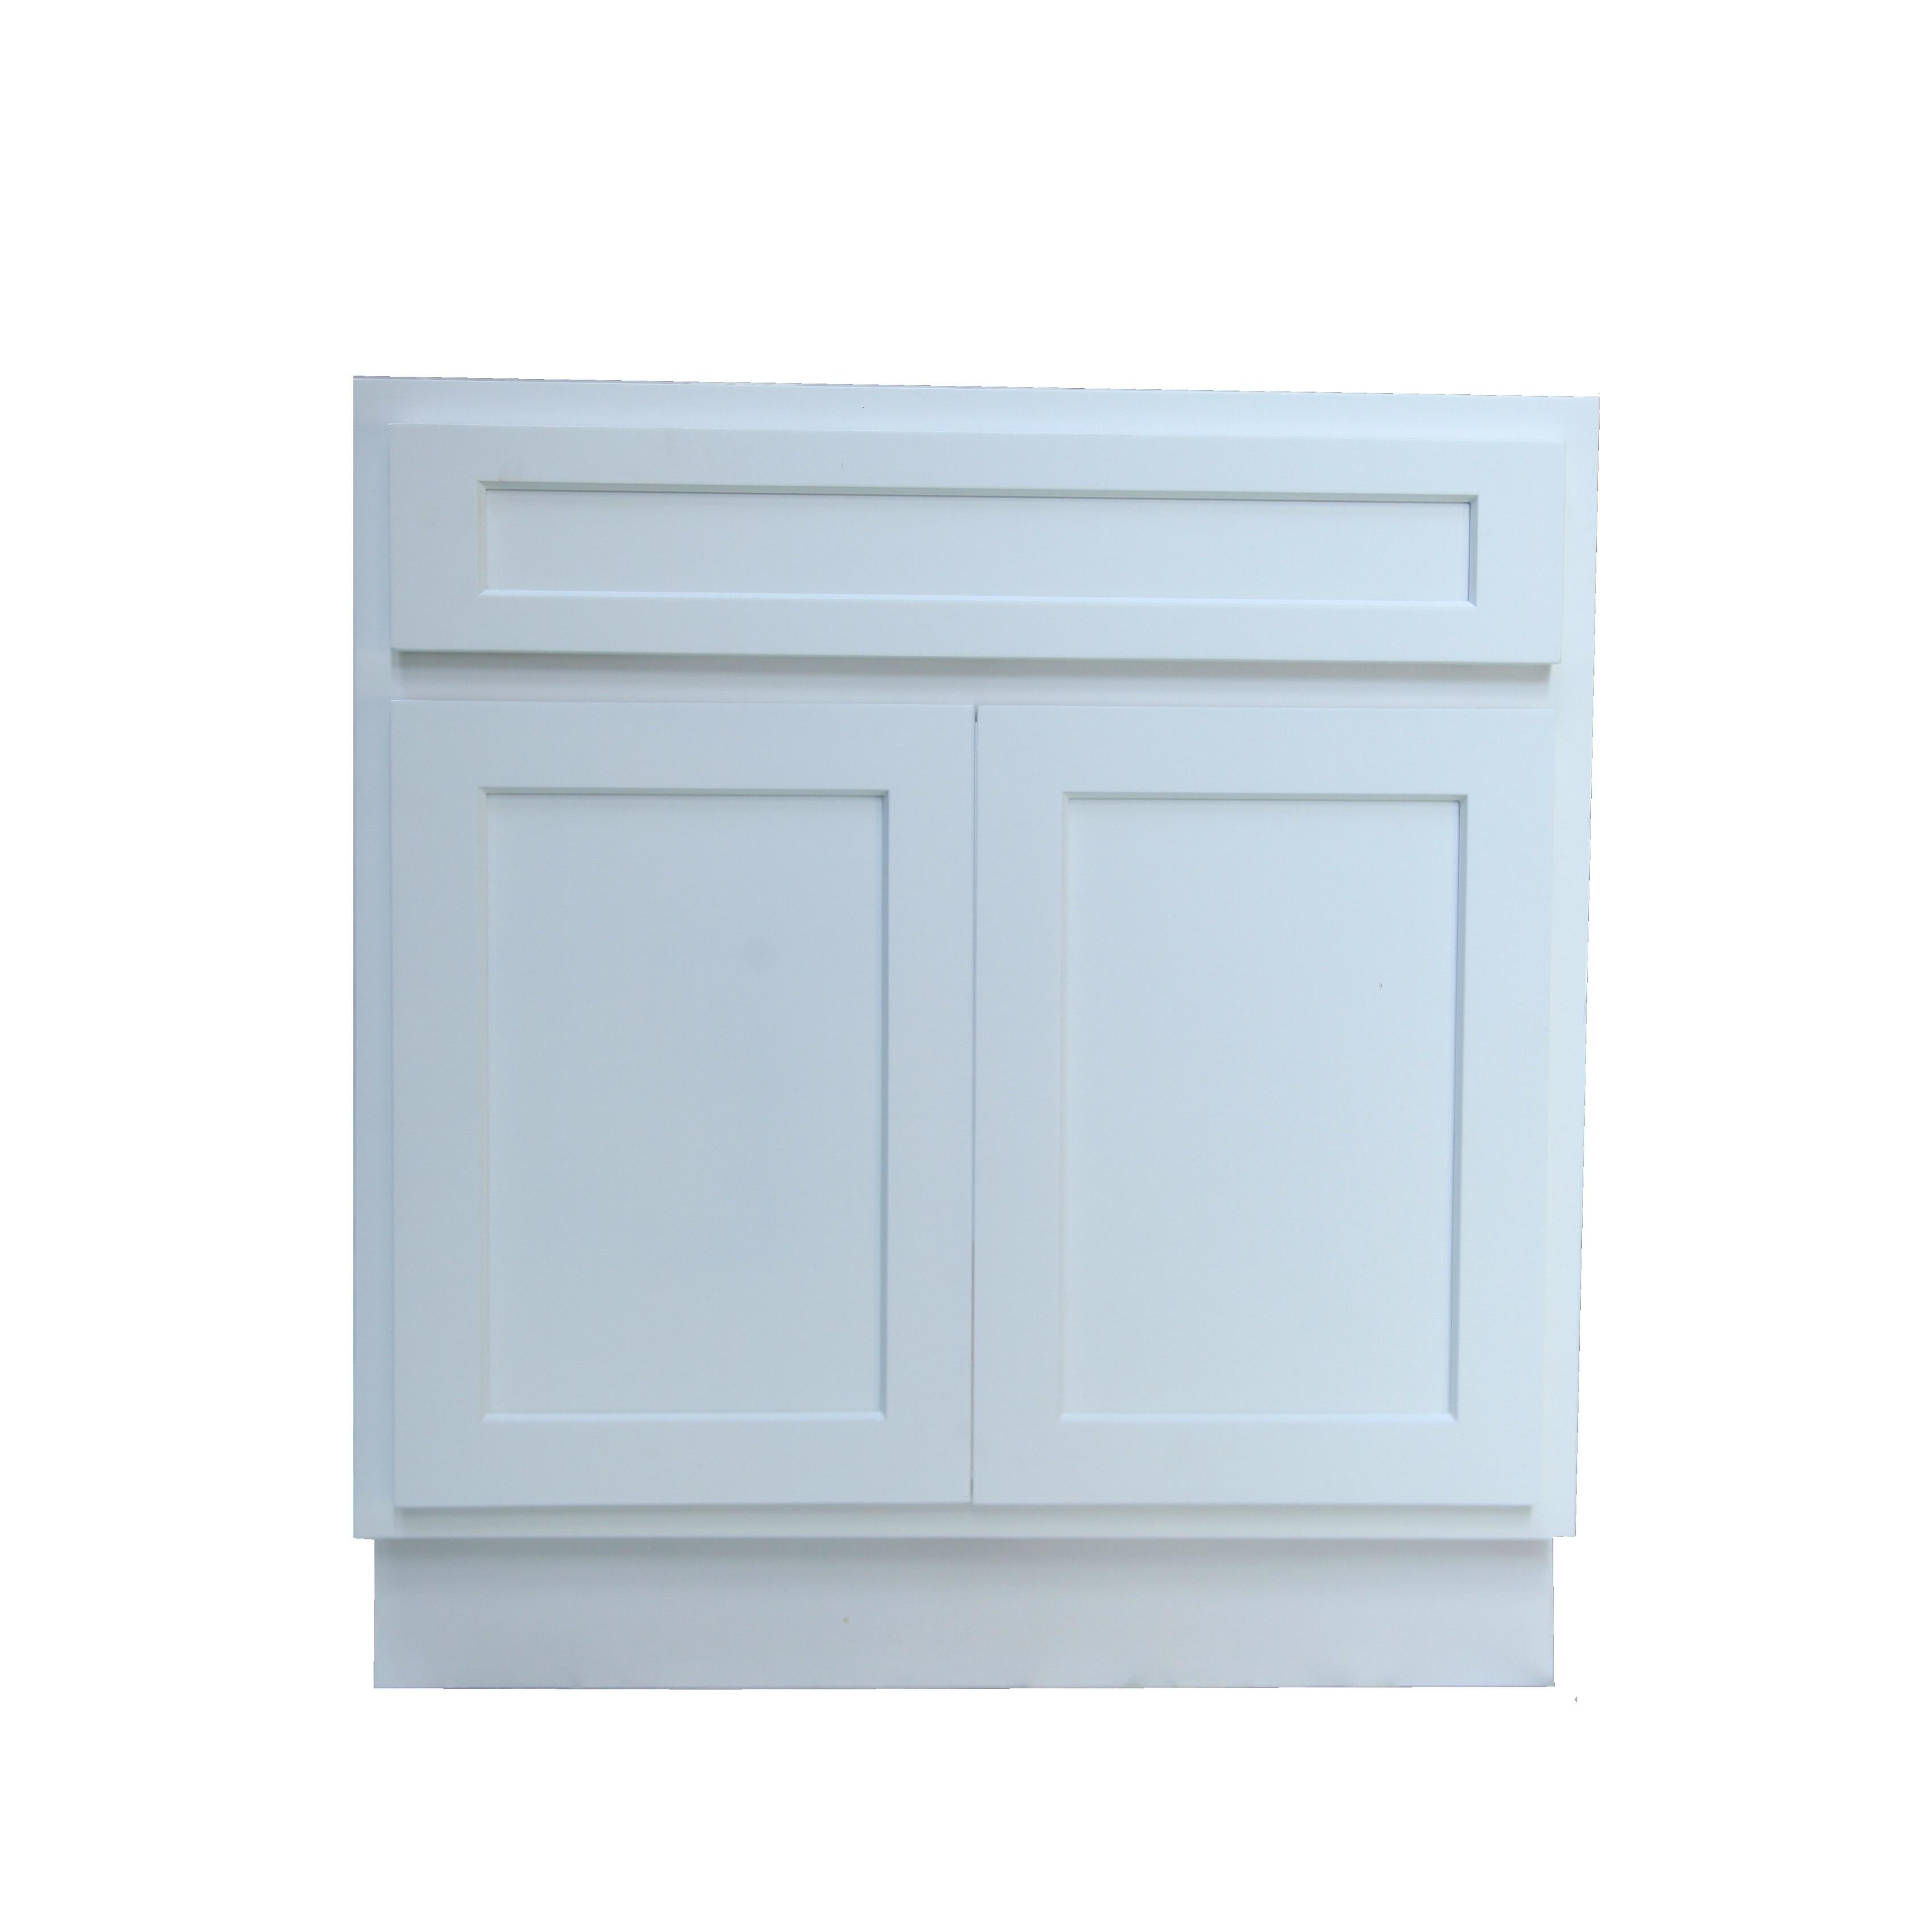 White Bathroom Vanities & Vanity Cabinets For Less | Overstock